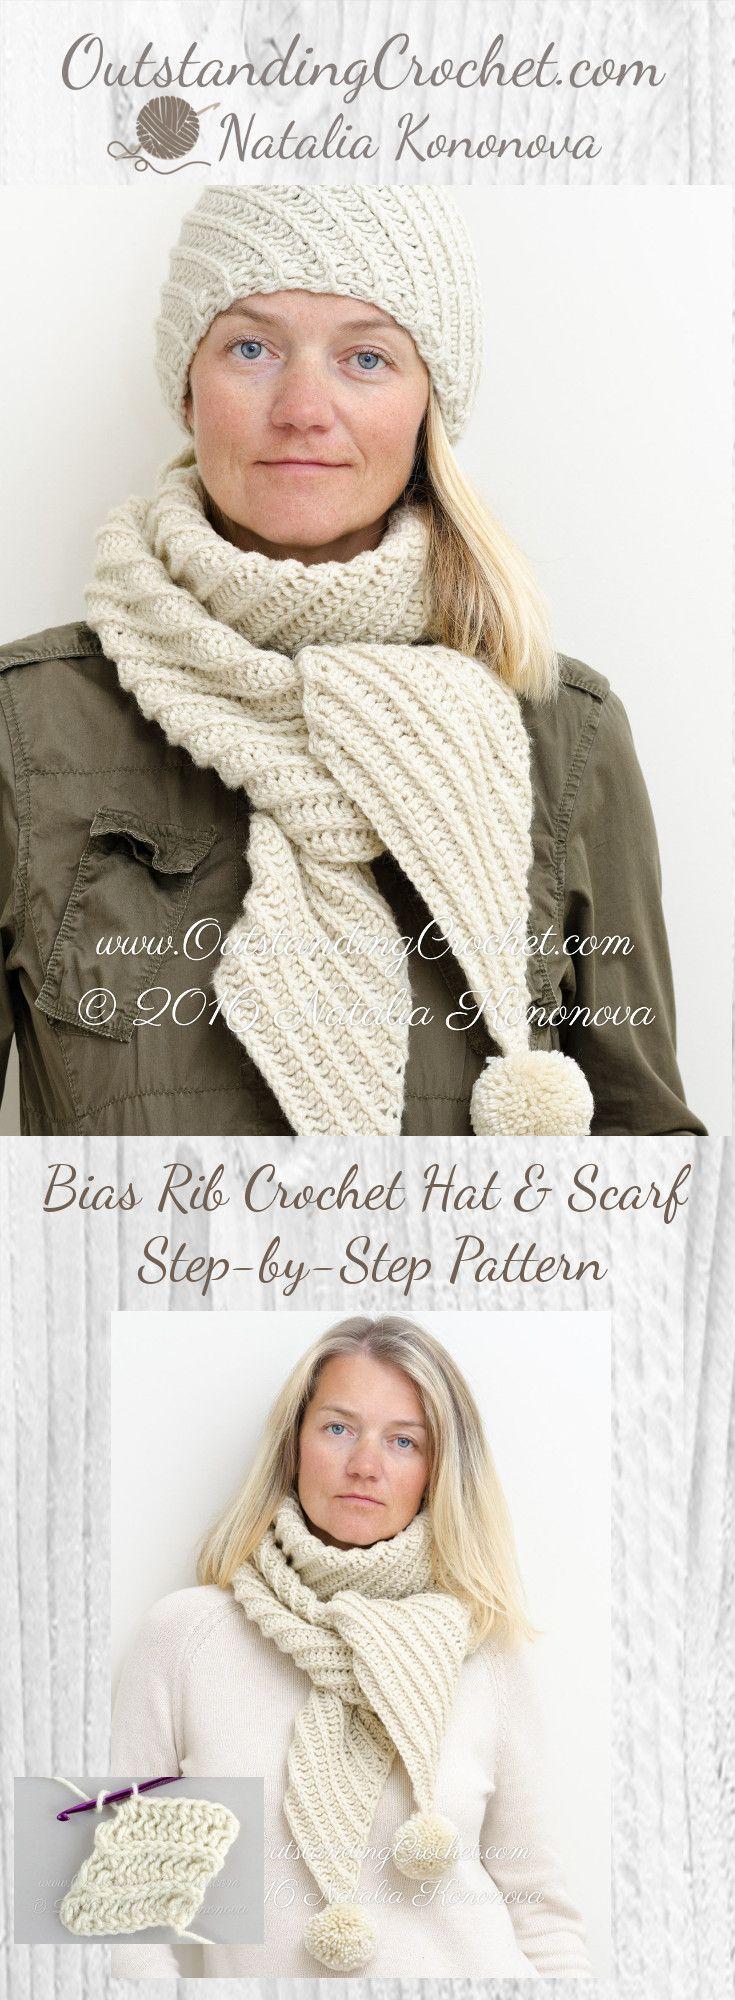 Bias Rib Stitch Crochet Hat and Scarf Step-by-Step Crochet Pattern ...